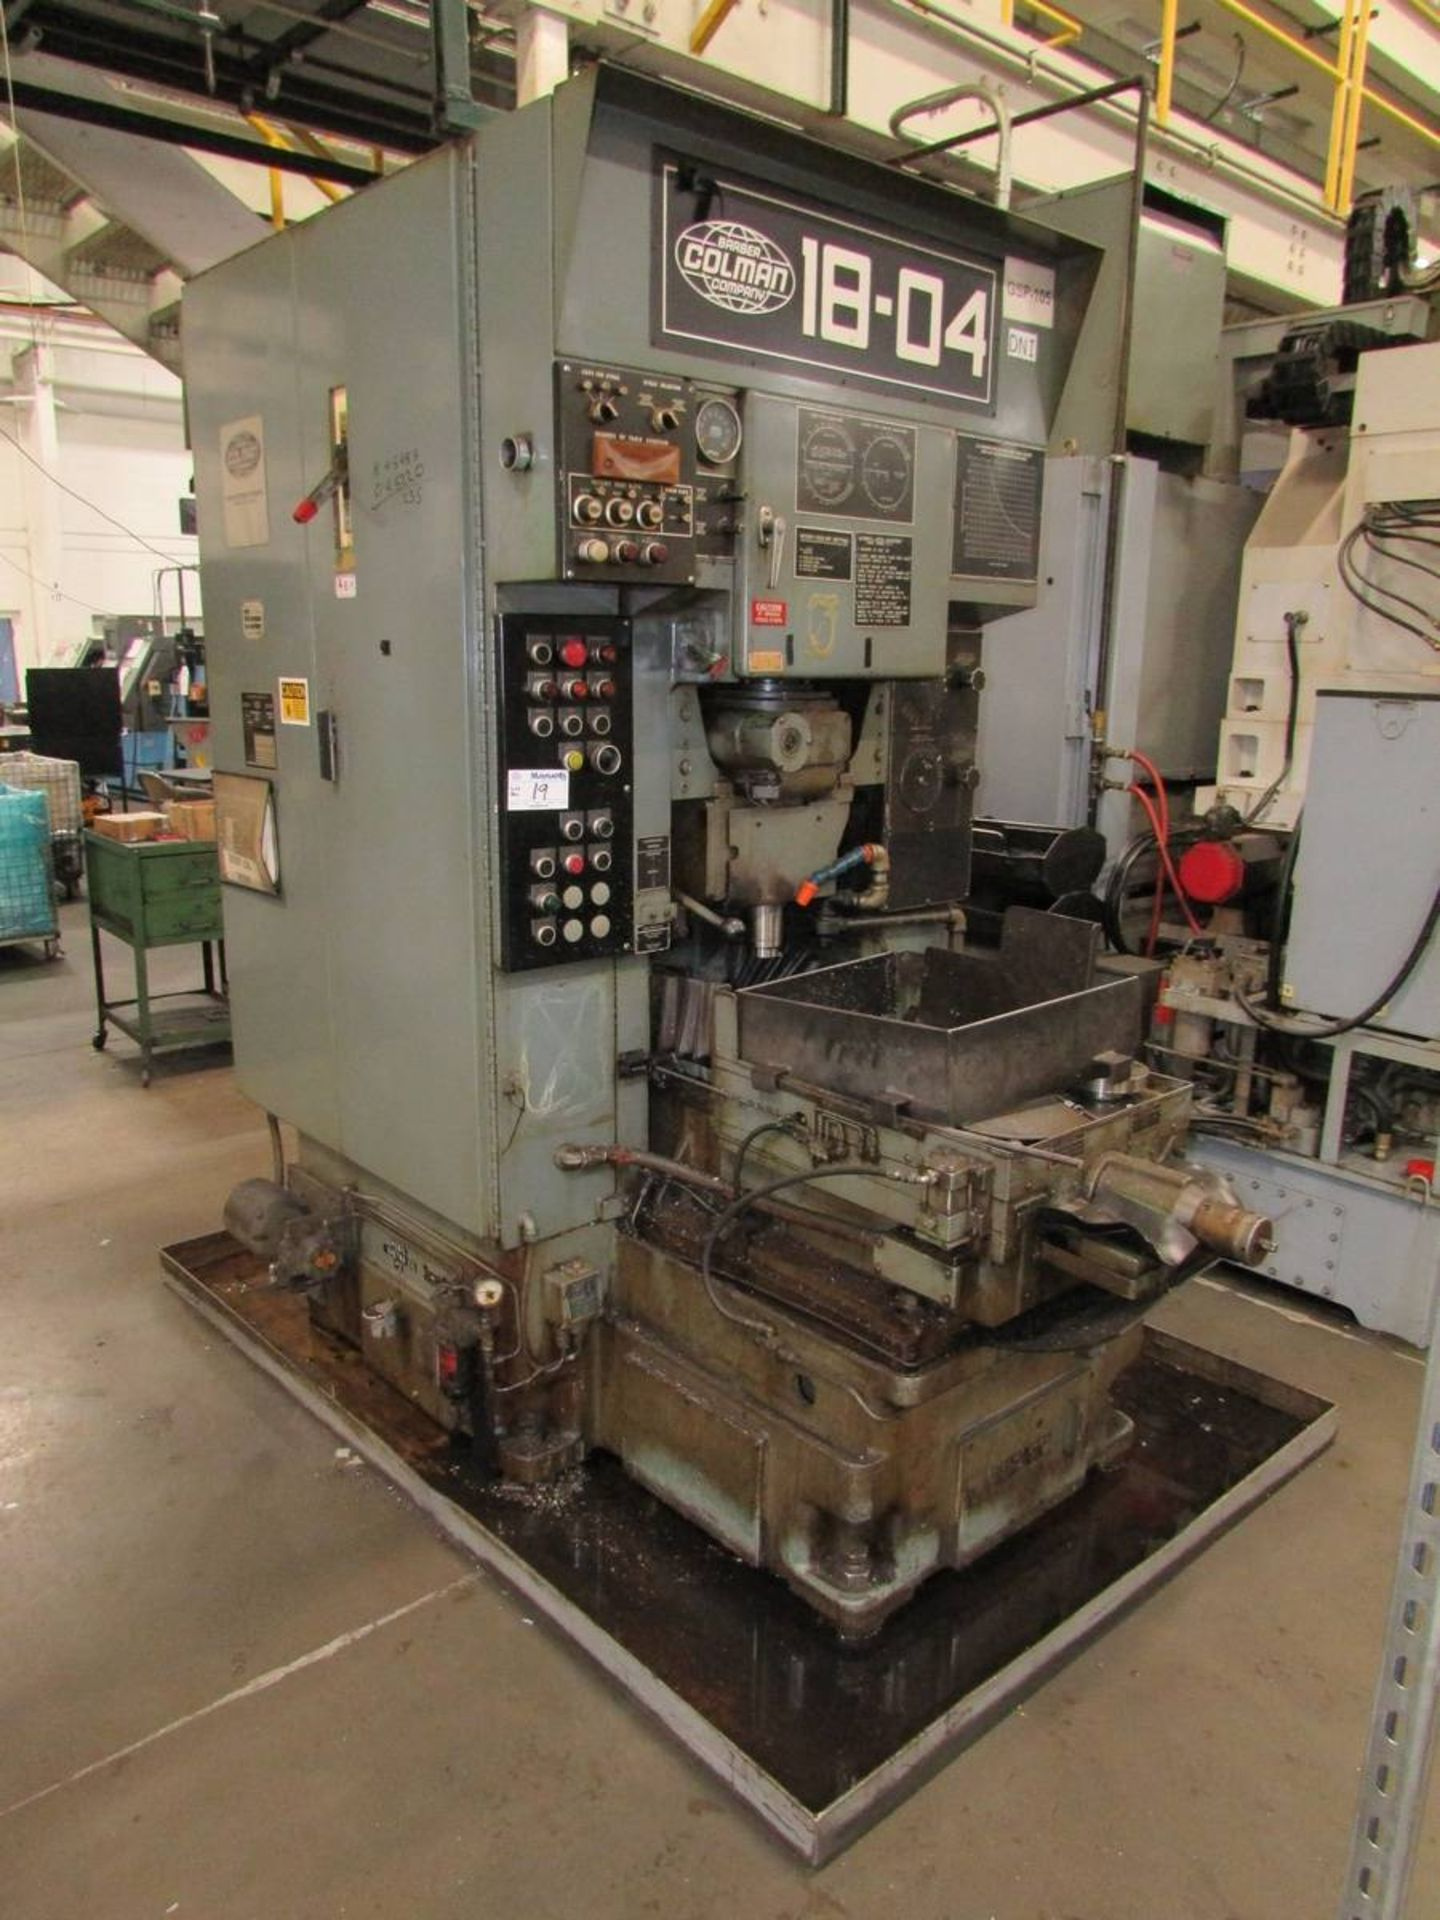 Barber Colman 18-04 Vertical Gear Shaping Machine